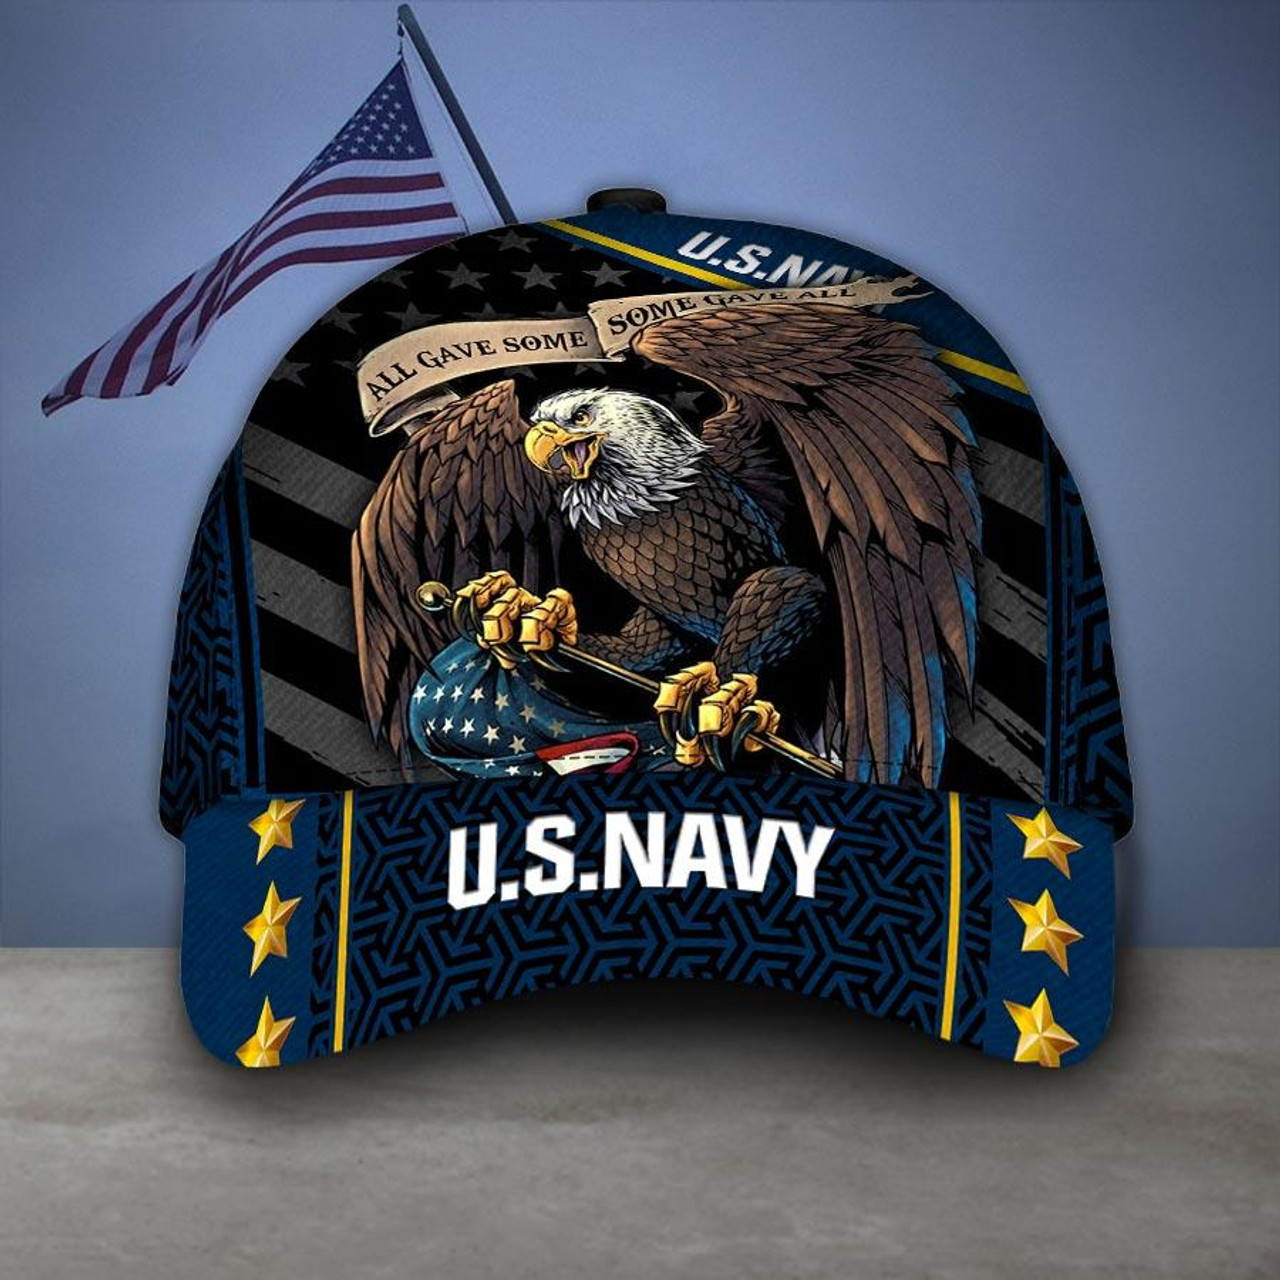 **(OFFICIAL-U.S.NAVY-VETERANS-HATS/CUSTOM-3D-GRAPHIC-PRINTED-PATRIOTIC-BIG-WINGED-BALD-EAGLE-DESIGN)**